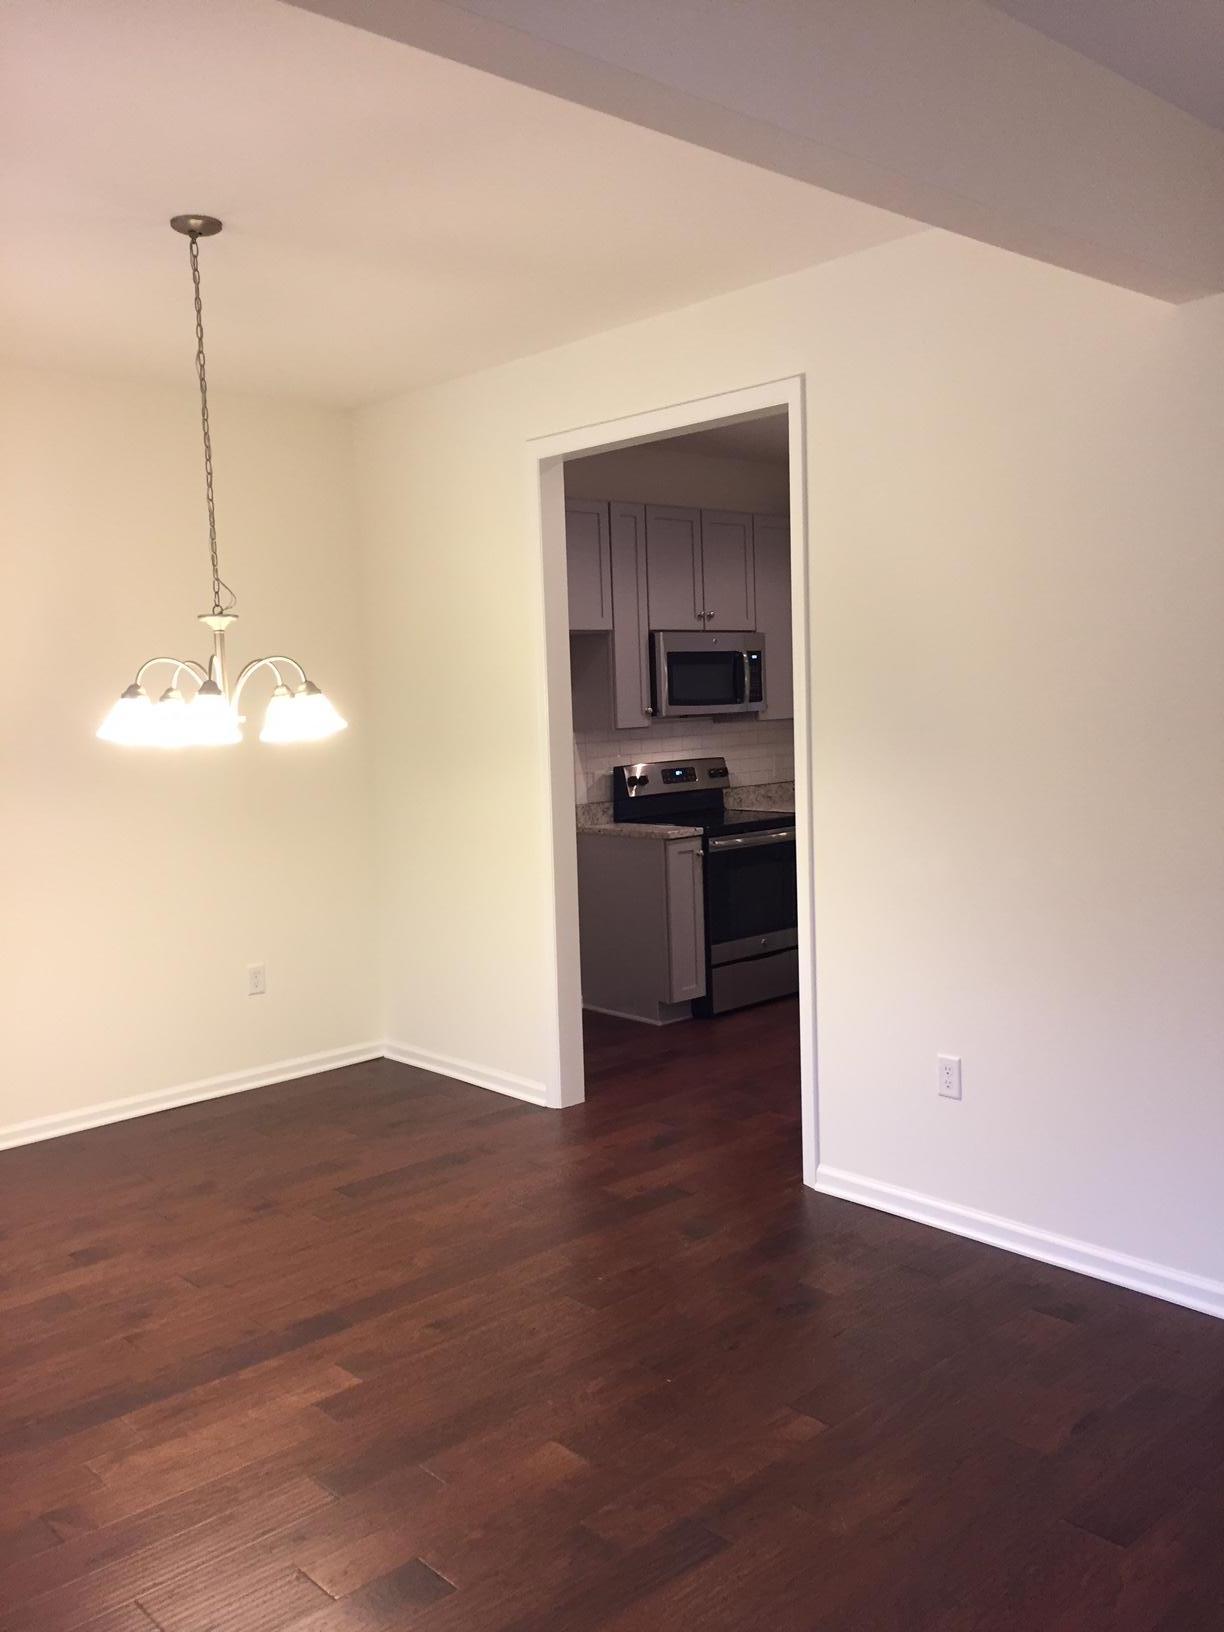 Riverland Place Homes For Sale - 274 Stefan, Charleston, SC - 20